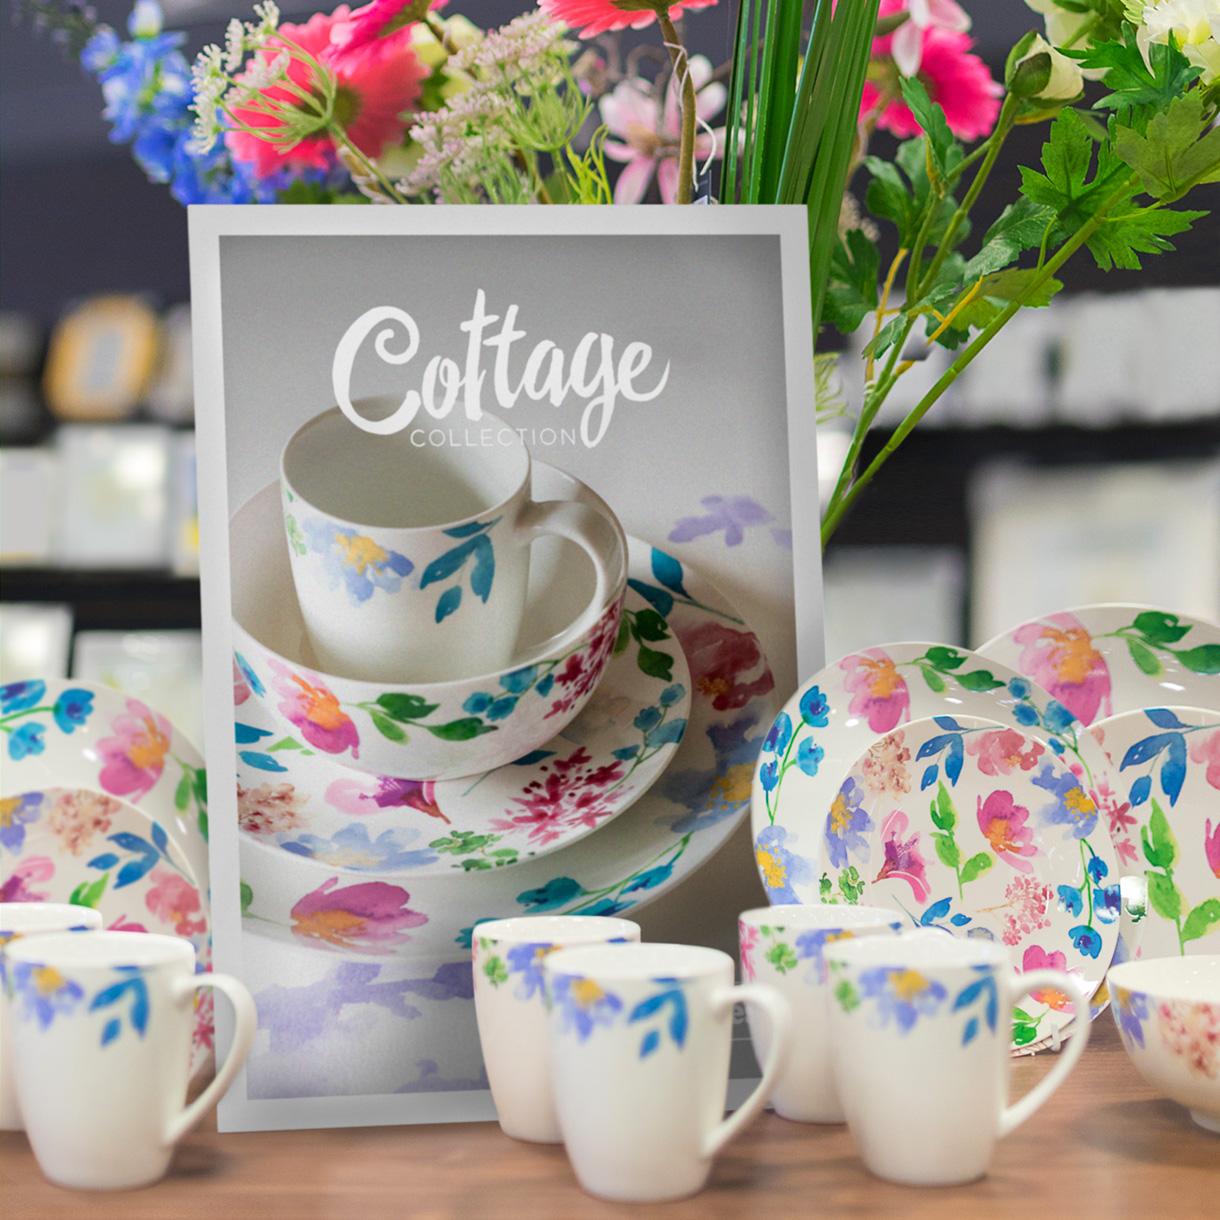 Principle brand agency Dublin Woodie's homewares brand design project cottage collection delph range